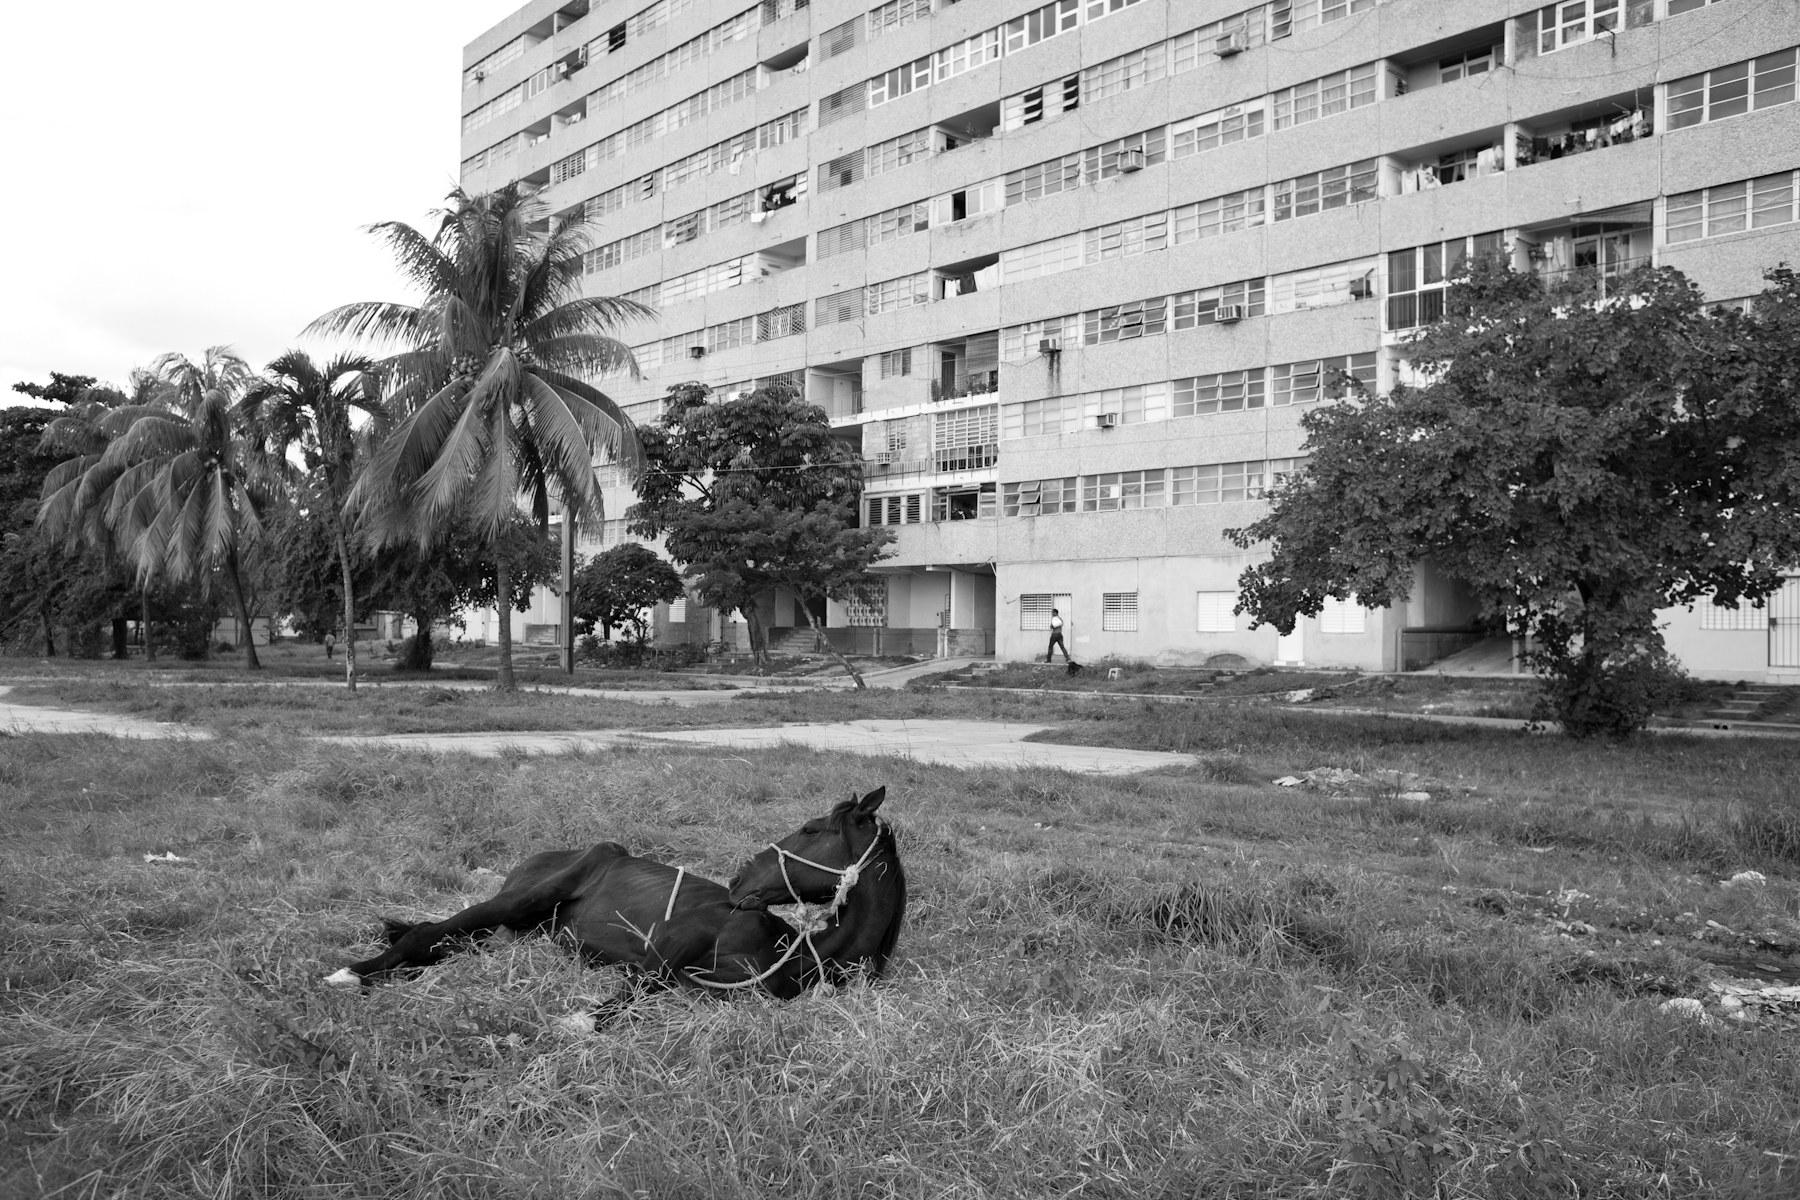 Portfolio_Cuba_Poole_2014_003.JPG